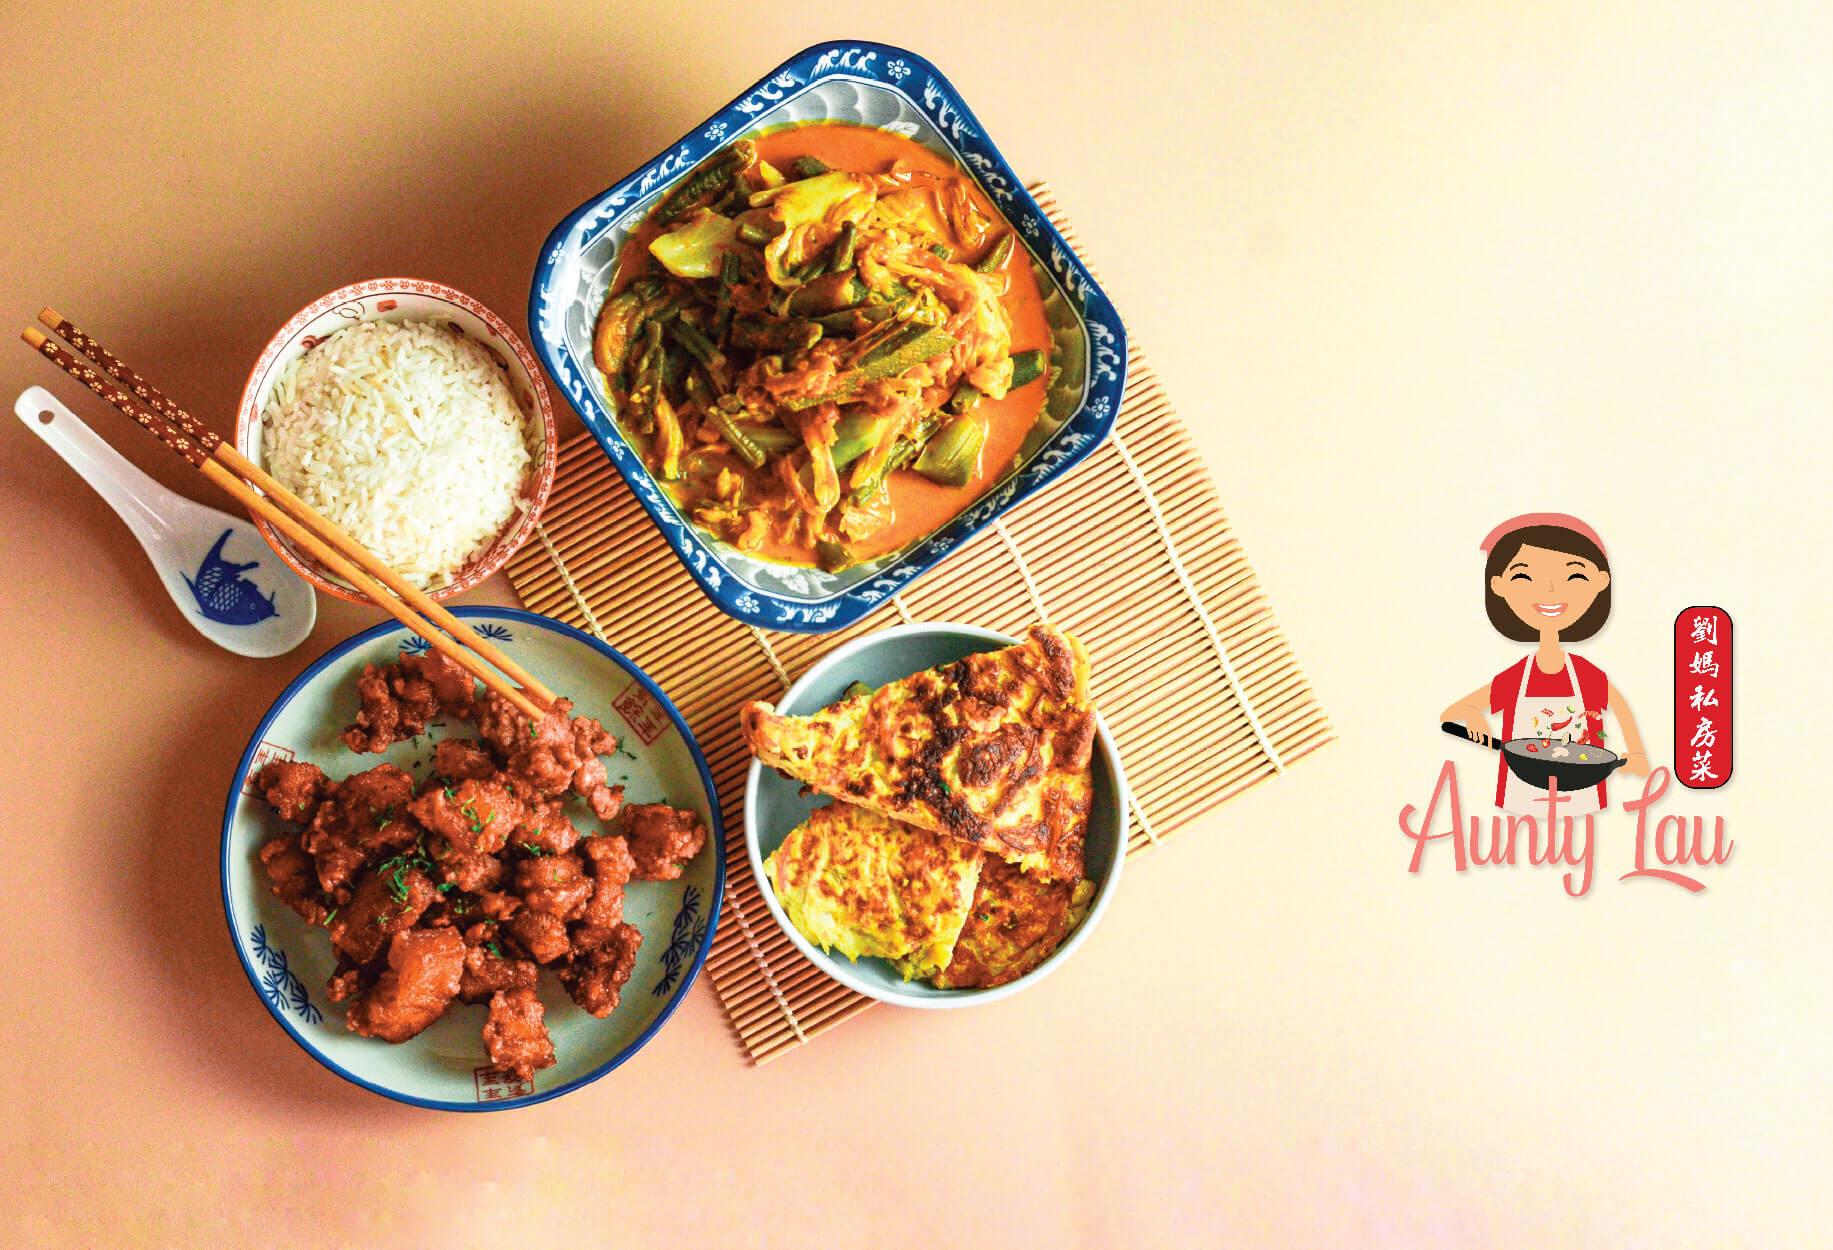 Lau Home Cook